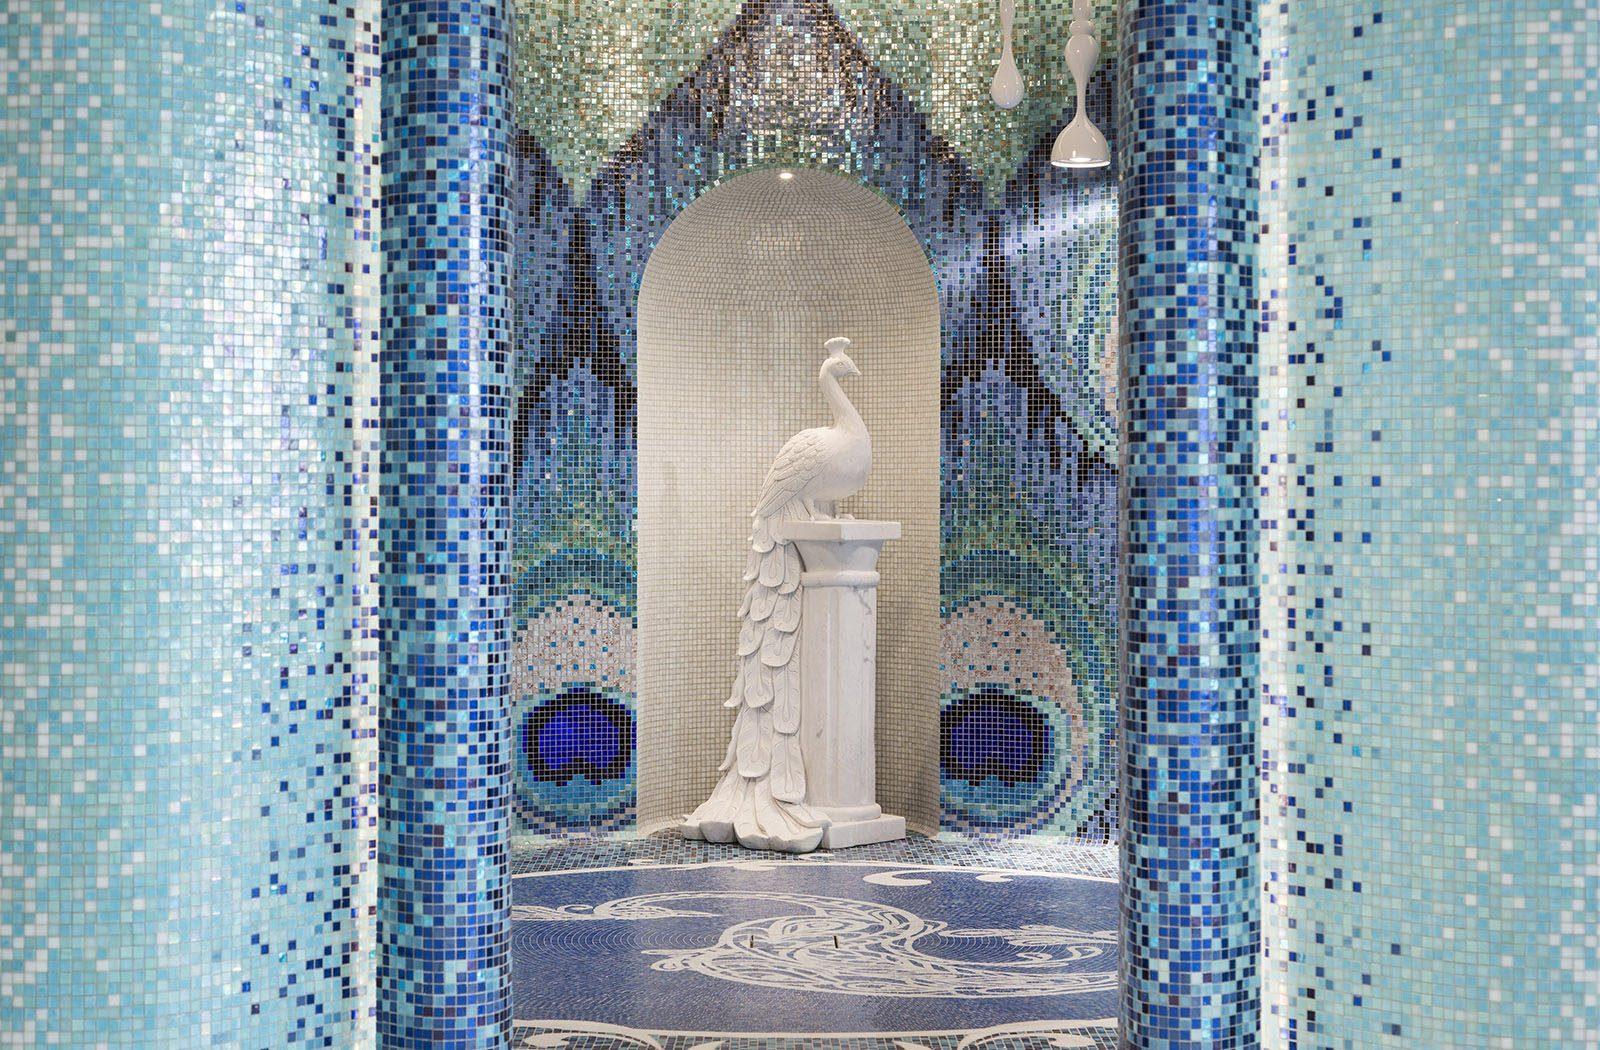 piscine verbano - la magia del mosaico (2)